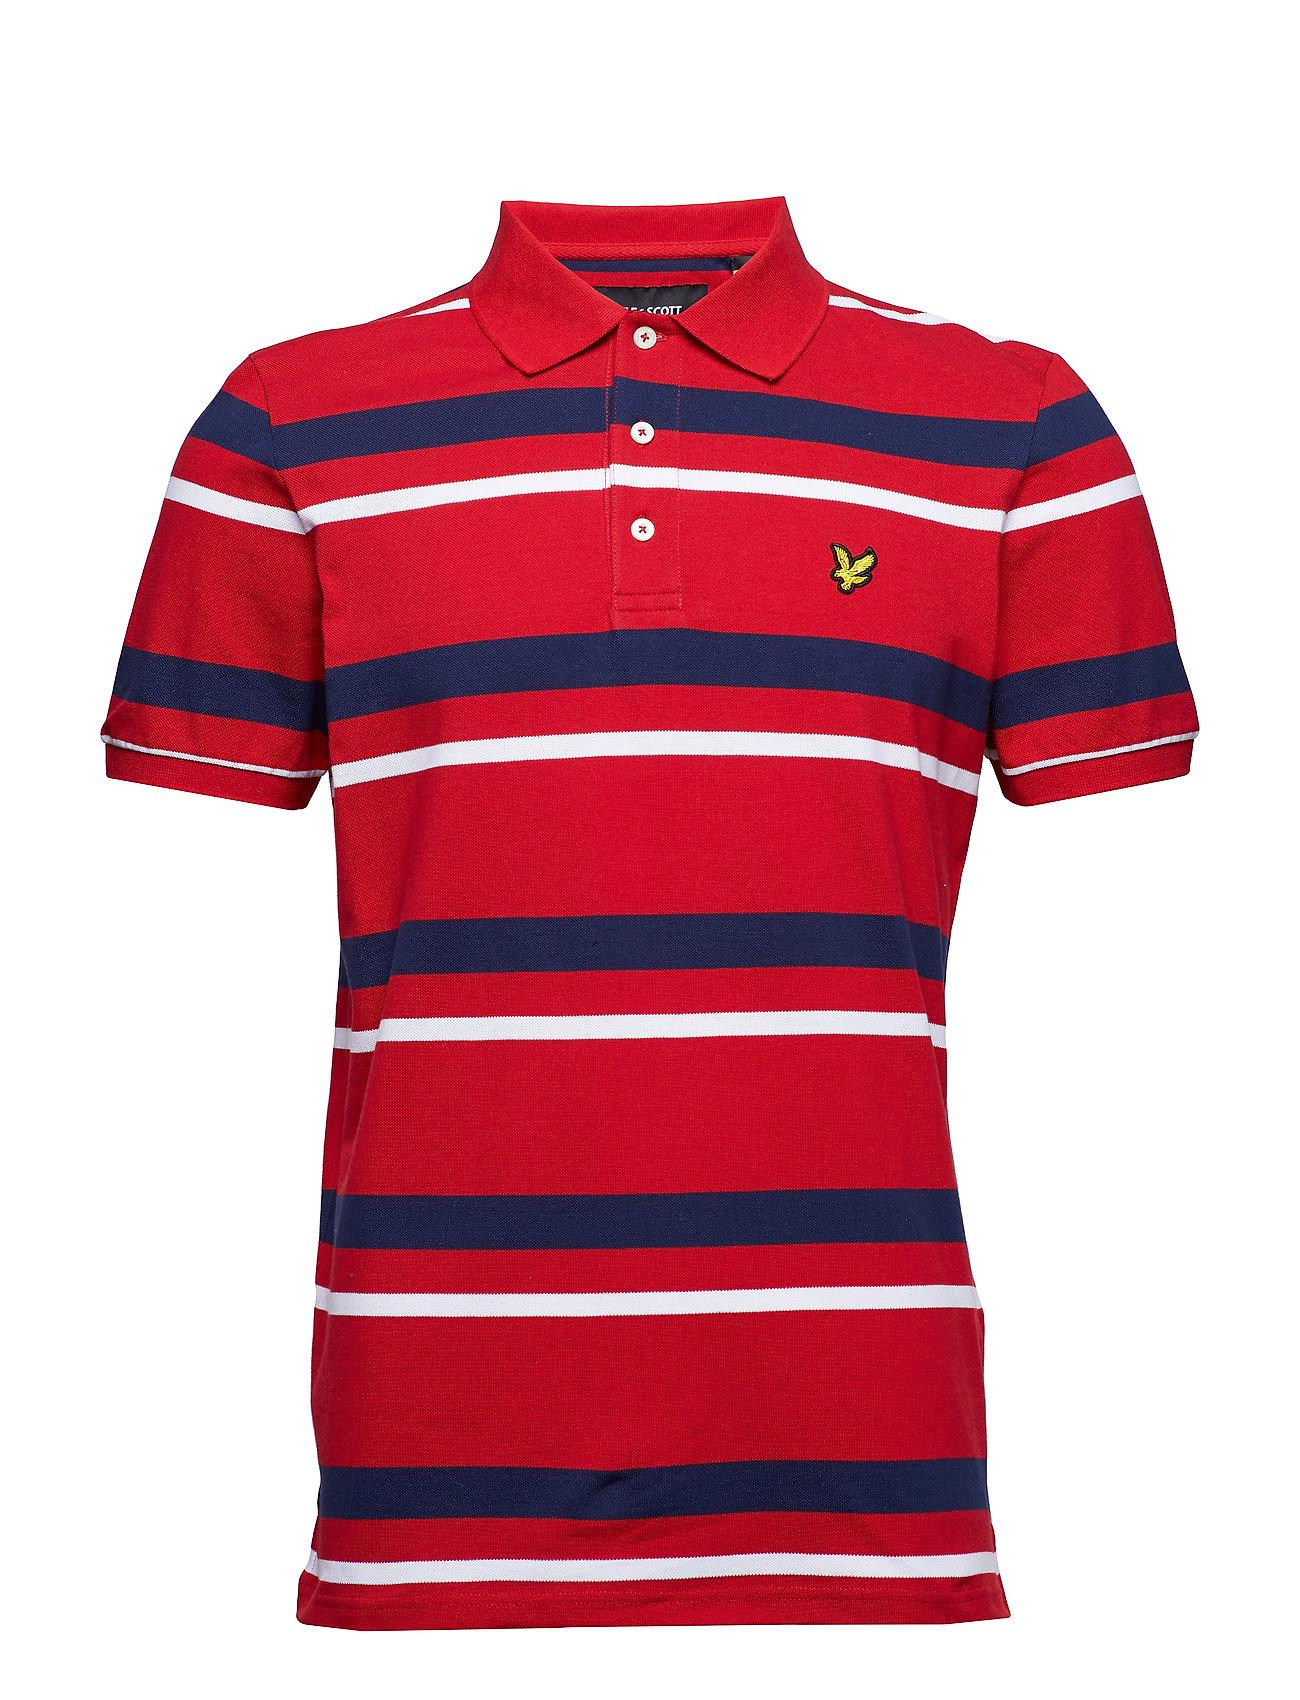 Lyle & Scott Stripe Polo Shirt Ögrönlar